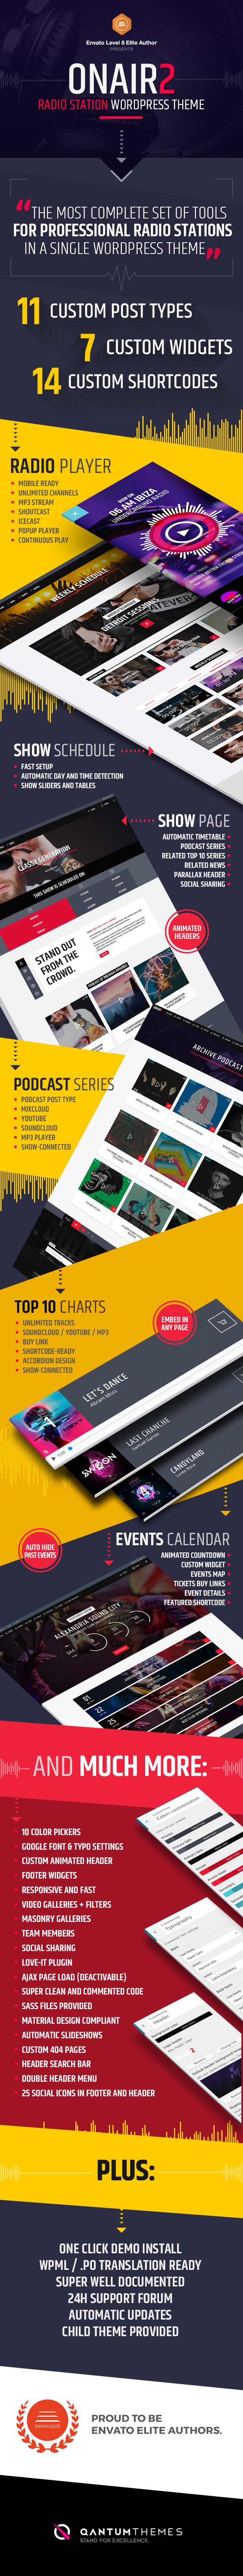 Onair2: Radio Station WordPress Theme With Non-Stop Music Player - 8